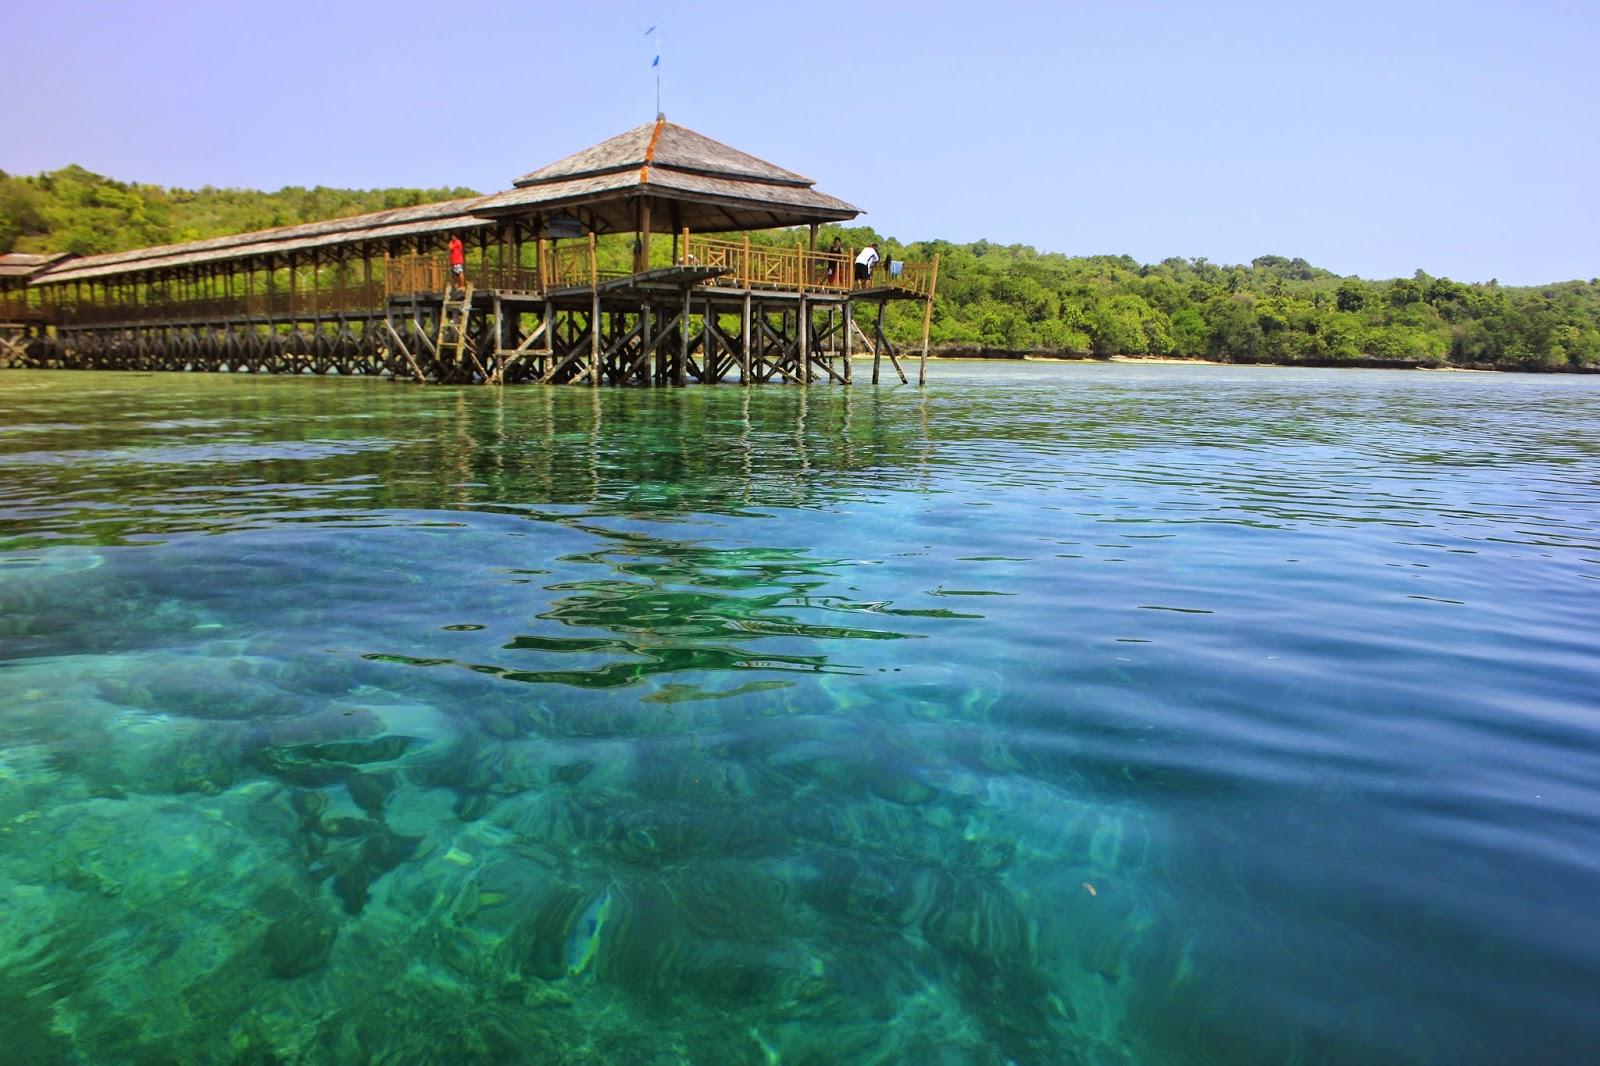 Mamuju Keindahan Alam Kota Kecil Sulawesi Barat Blog Ivacanza Transportasi